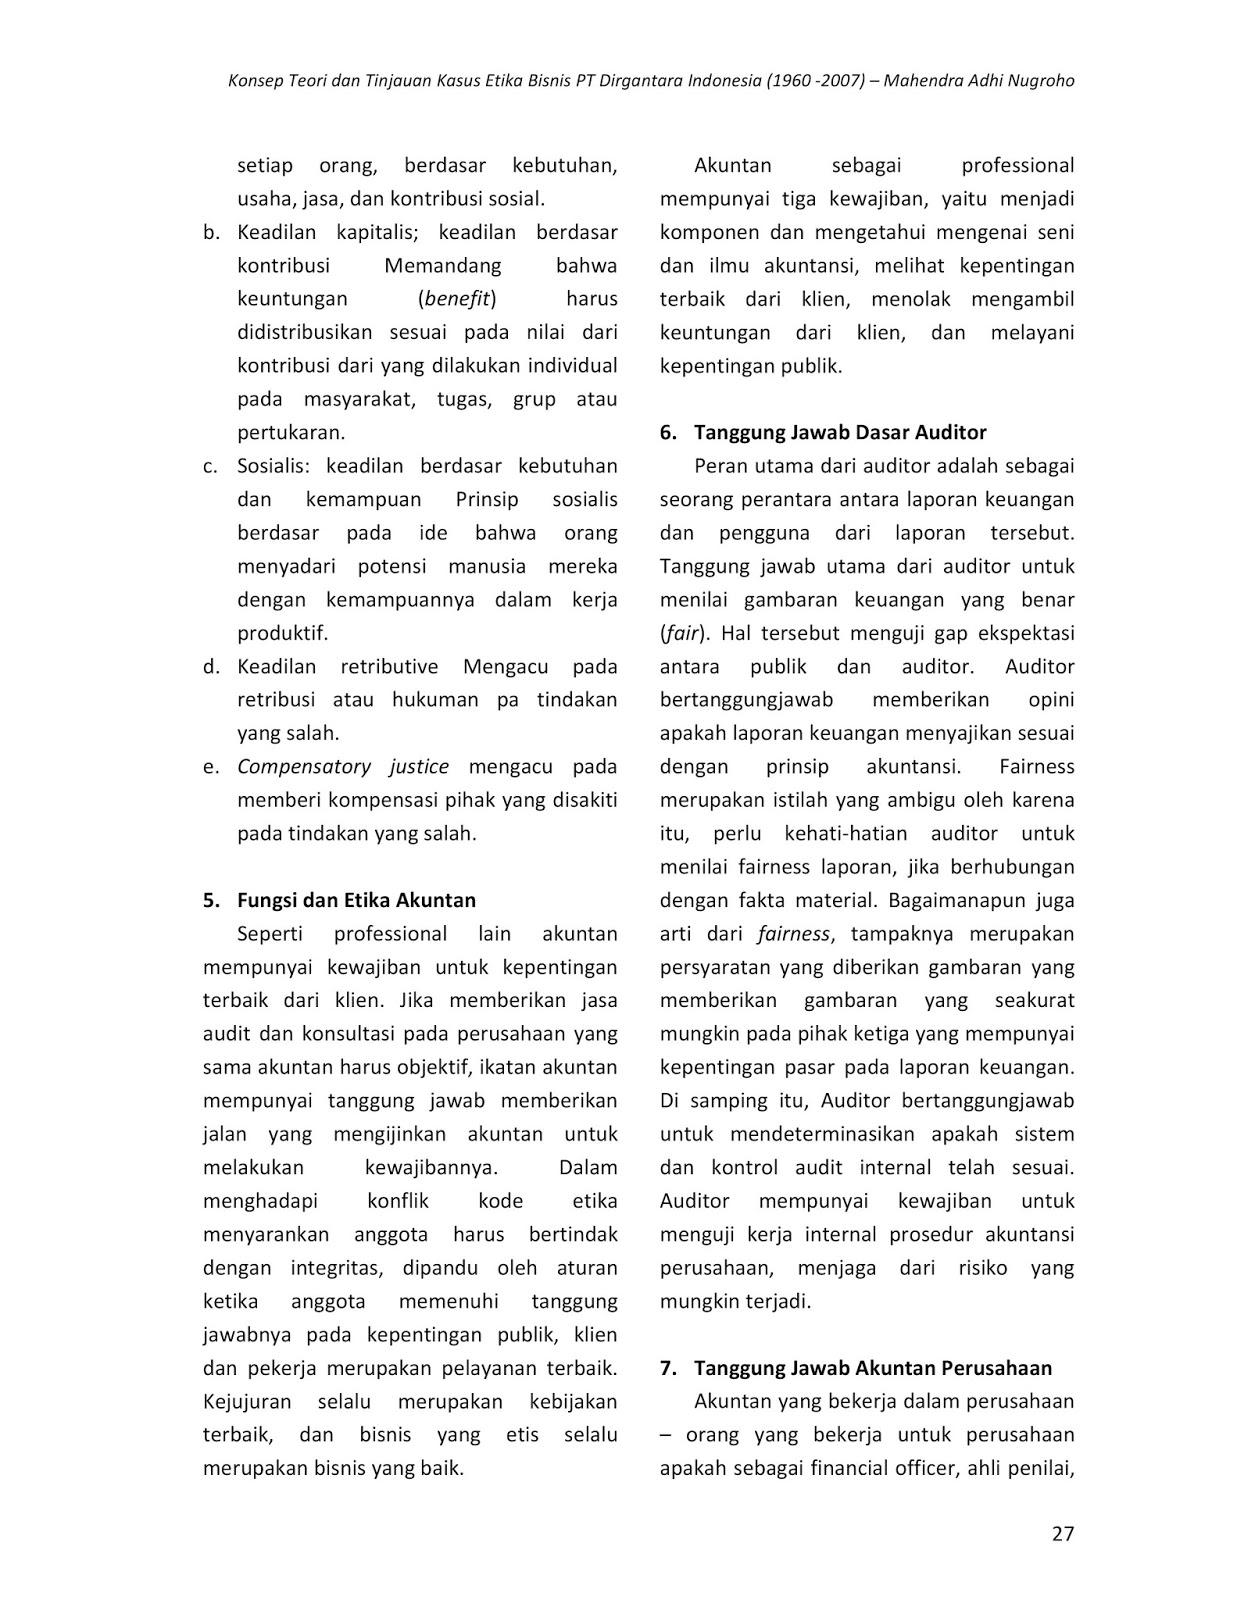 Yuliana Tugas 1 Etika Bisnis